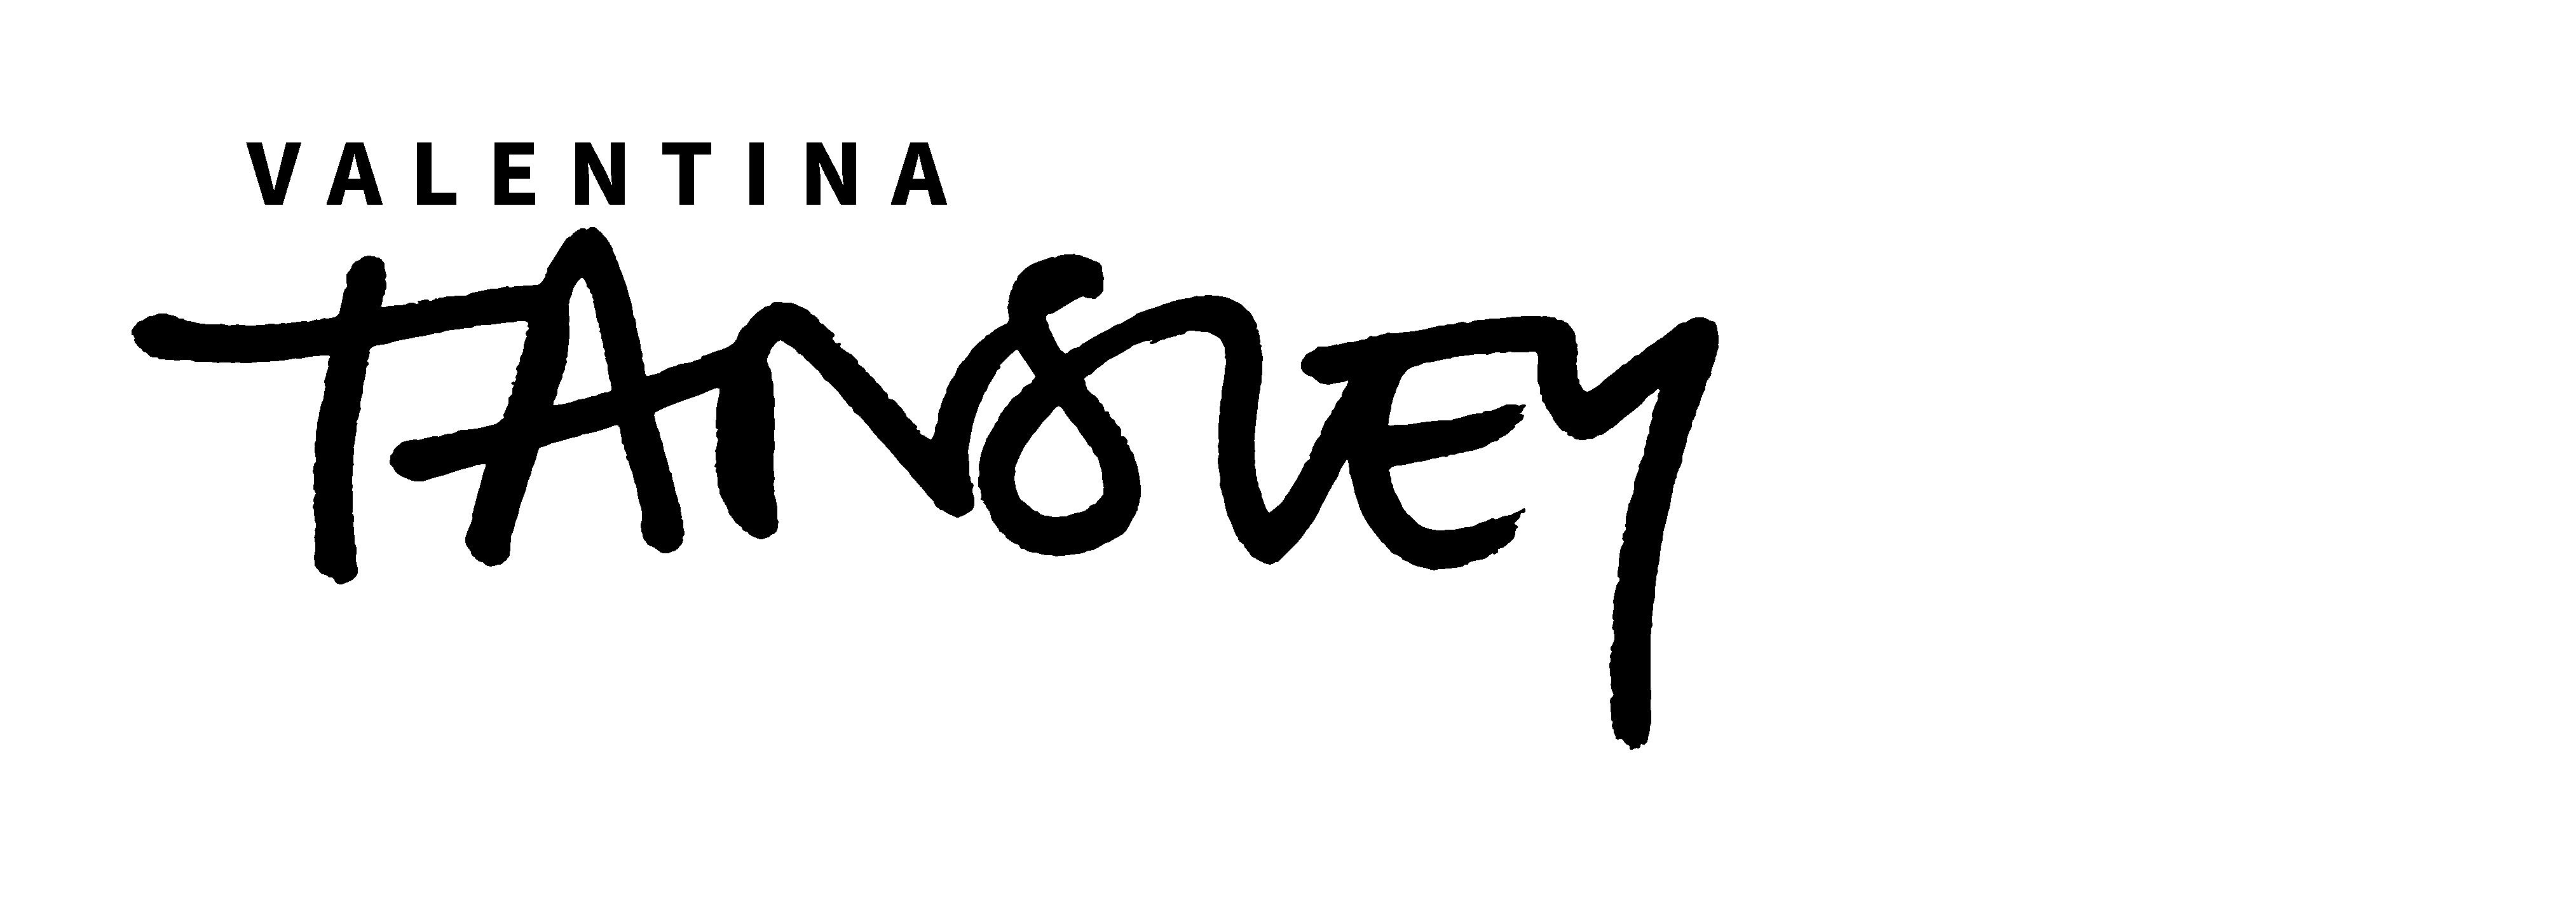 Valentina Tansley Logo